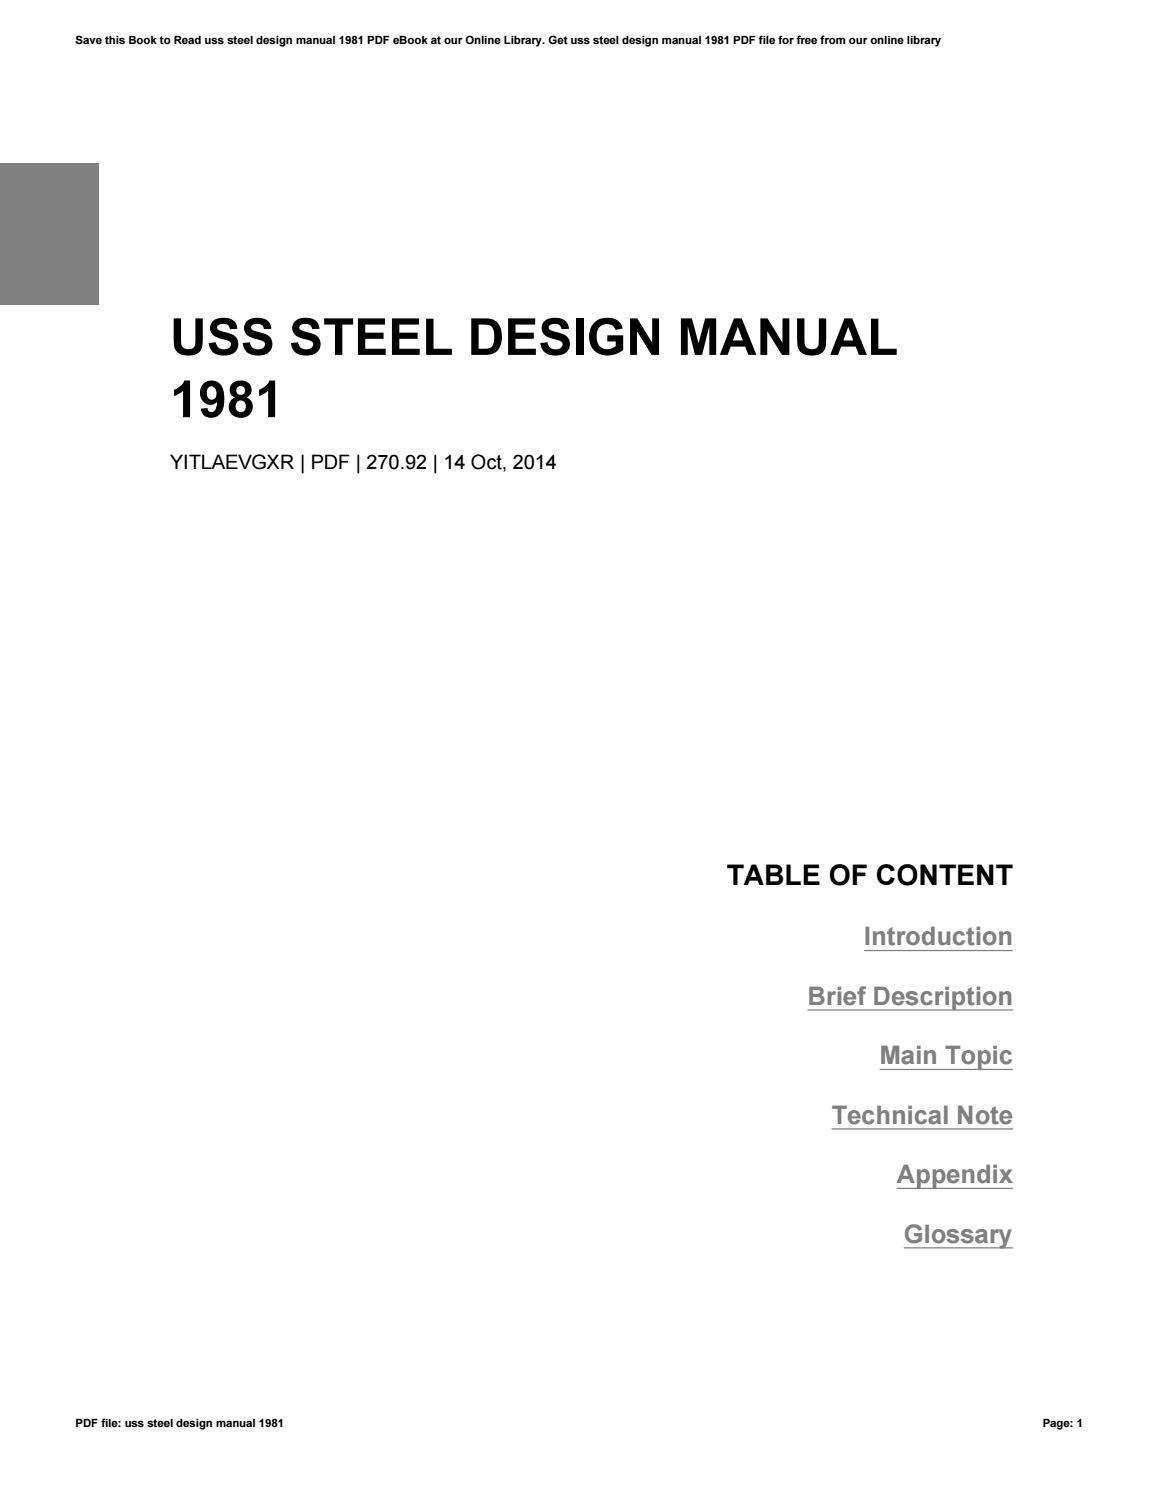 Uss Steel Design Manual 1981 By Mitchellwright4774 Issuu